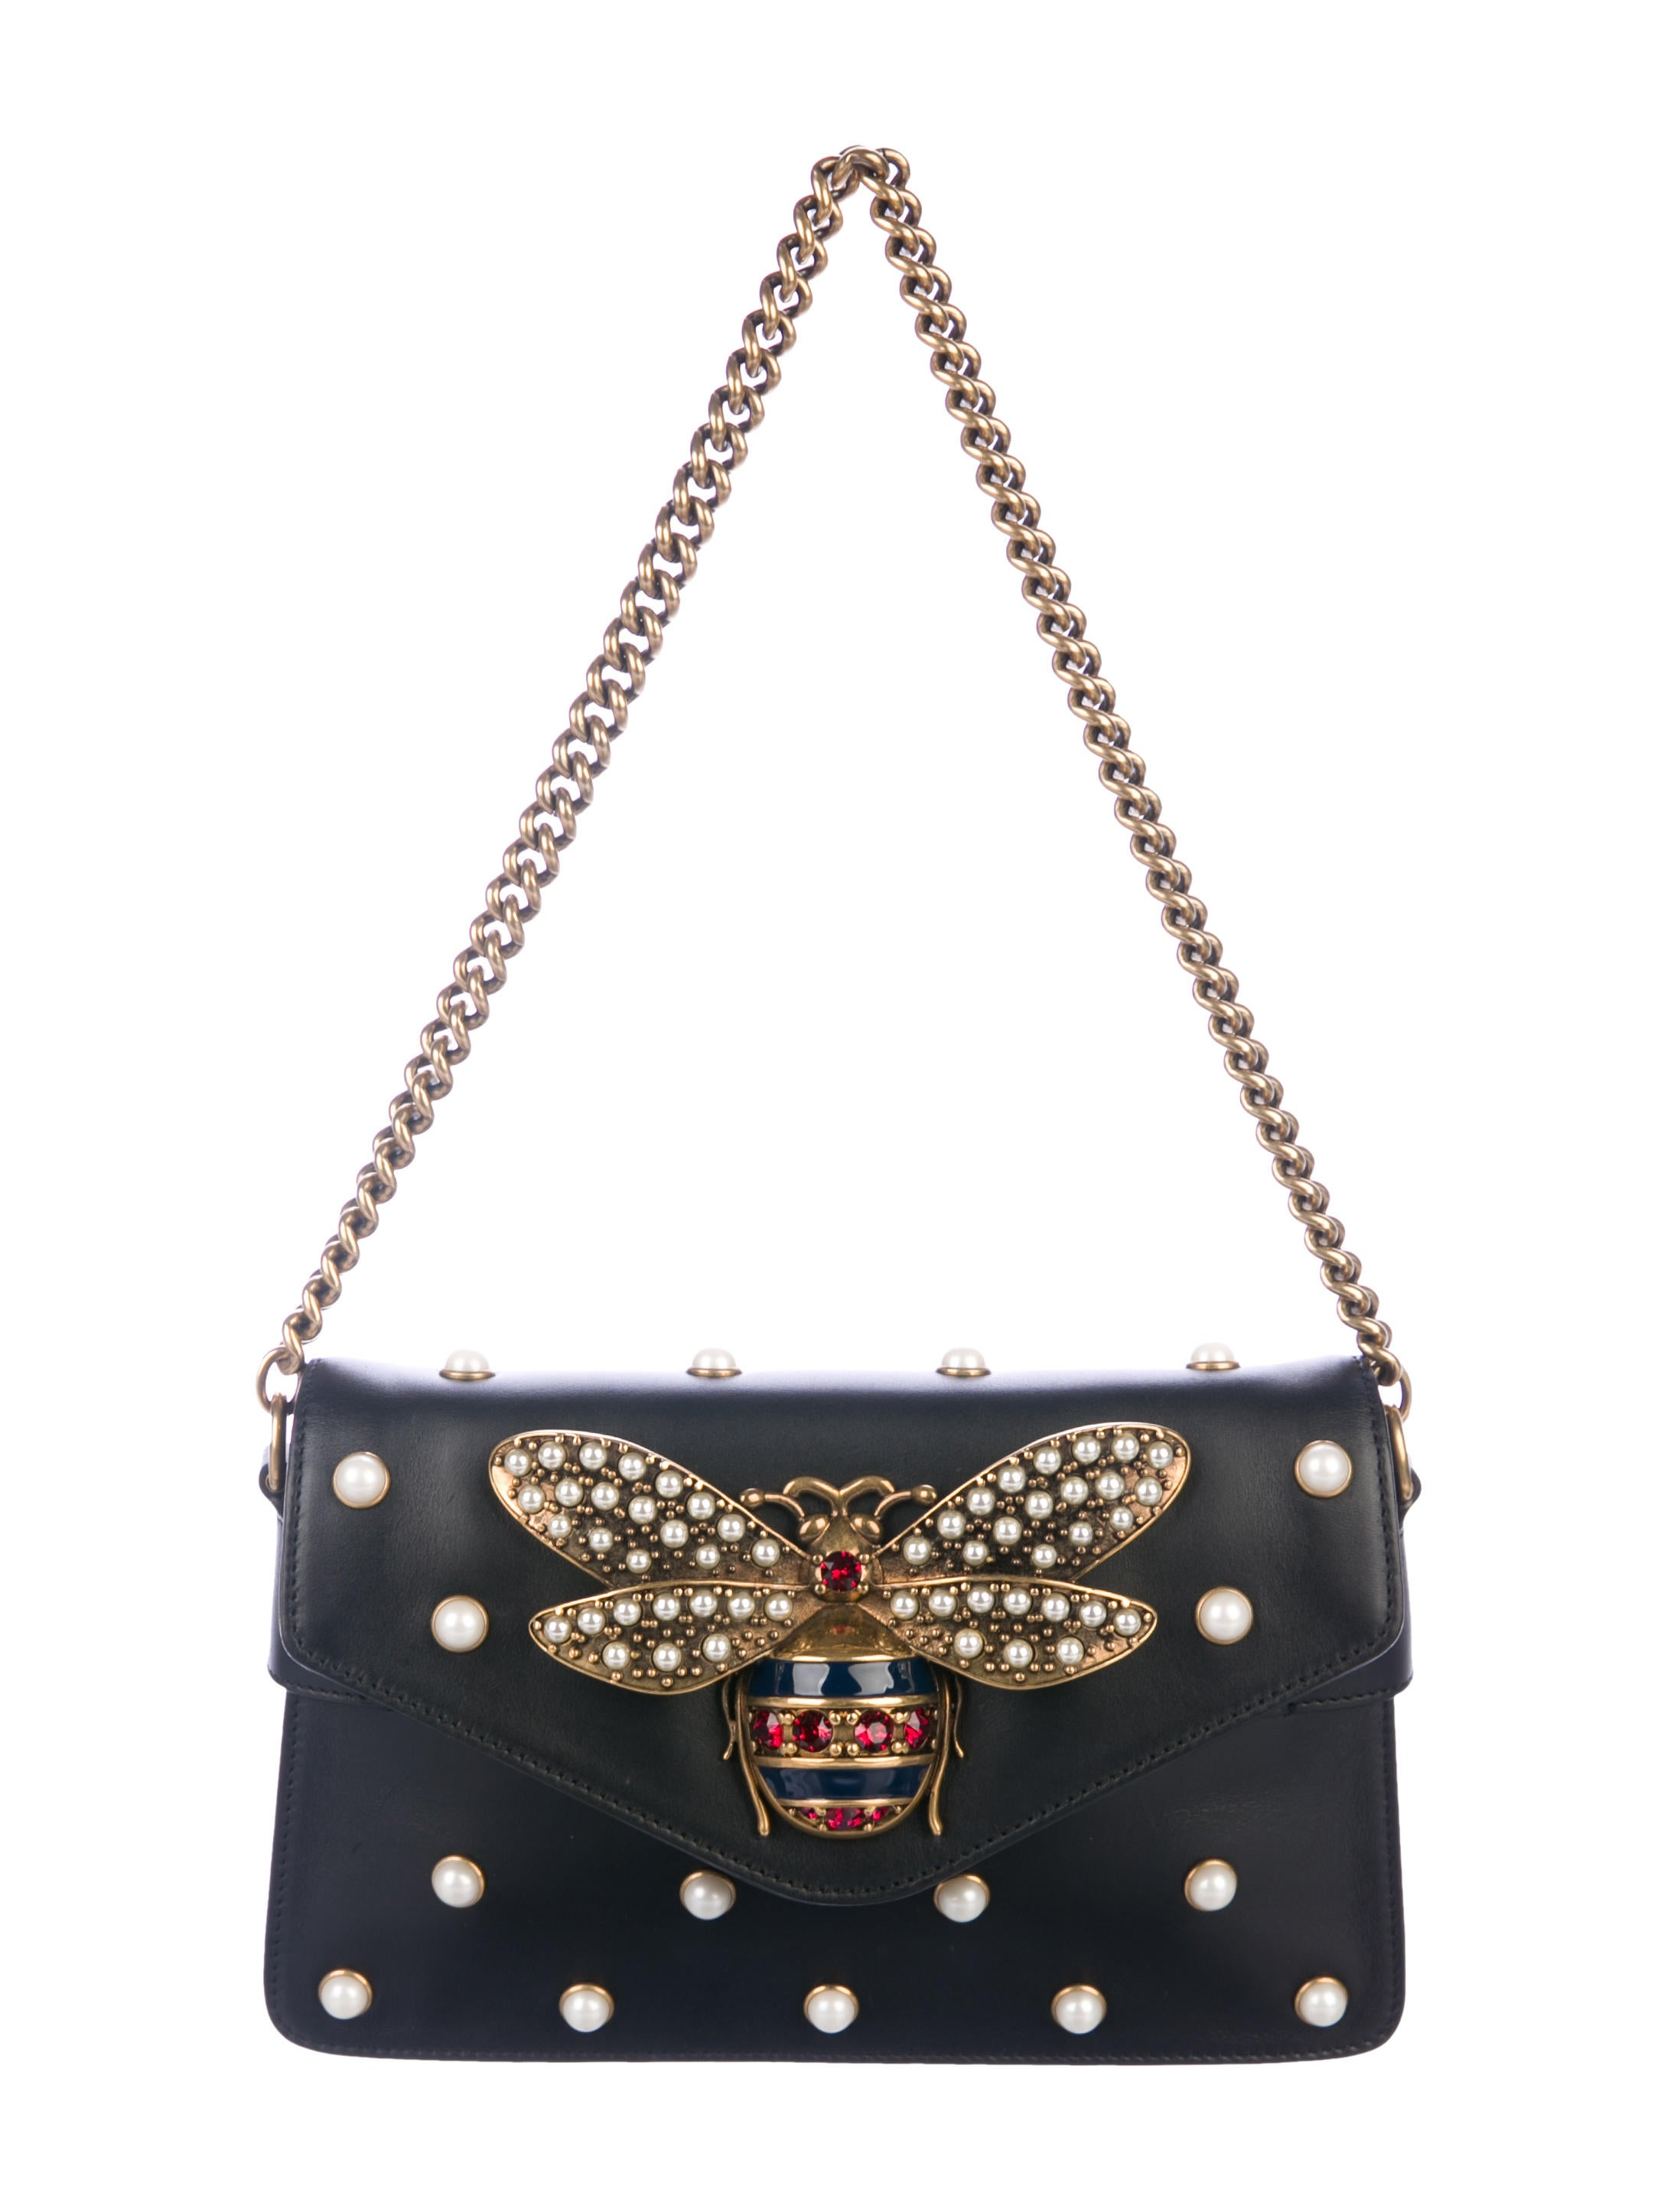 956645d089cc Gucci 2017 Broadway Leather Mini Bag - Handbags - GUC296024 | The ...